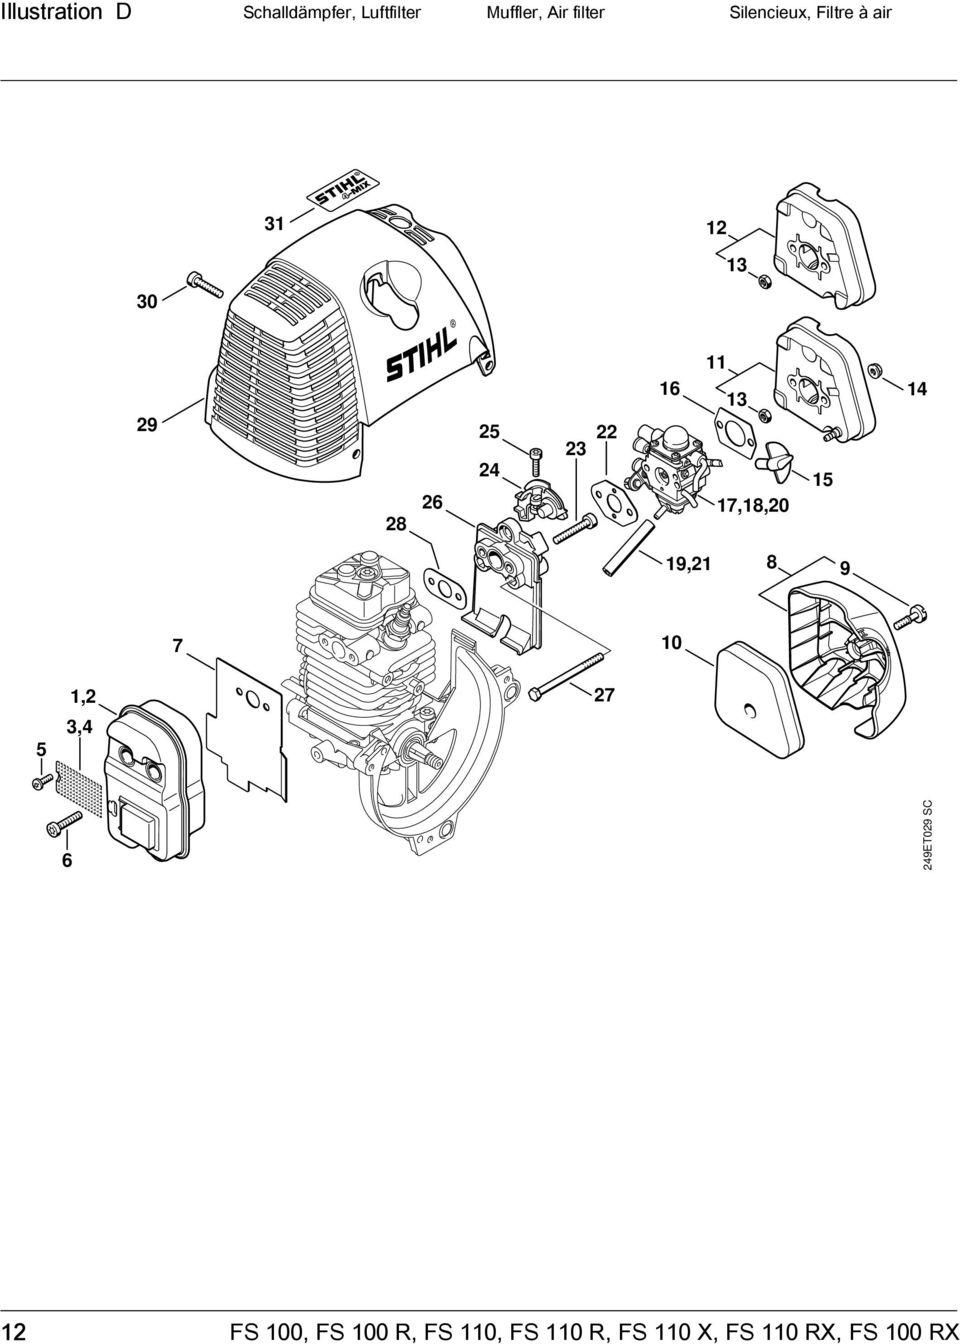 Stihl Trimmer Wiring Diagram. . Wiring Diagram